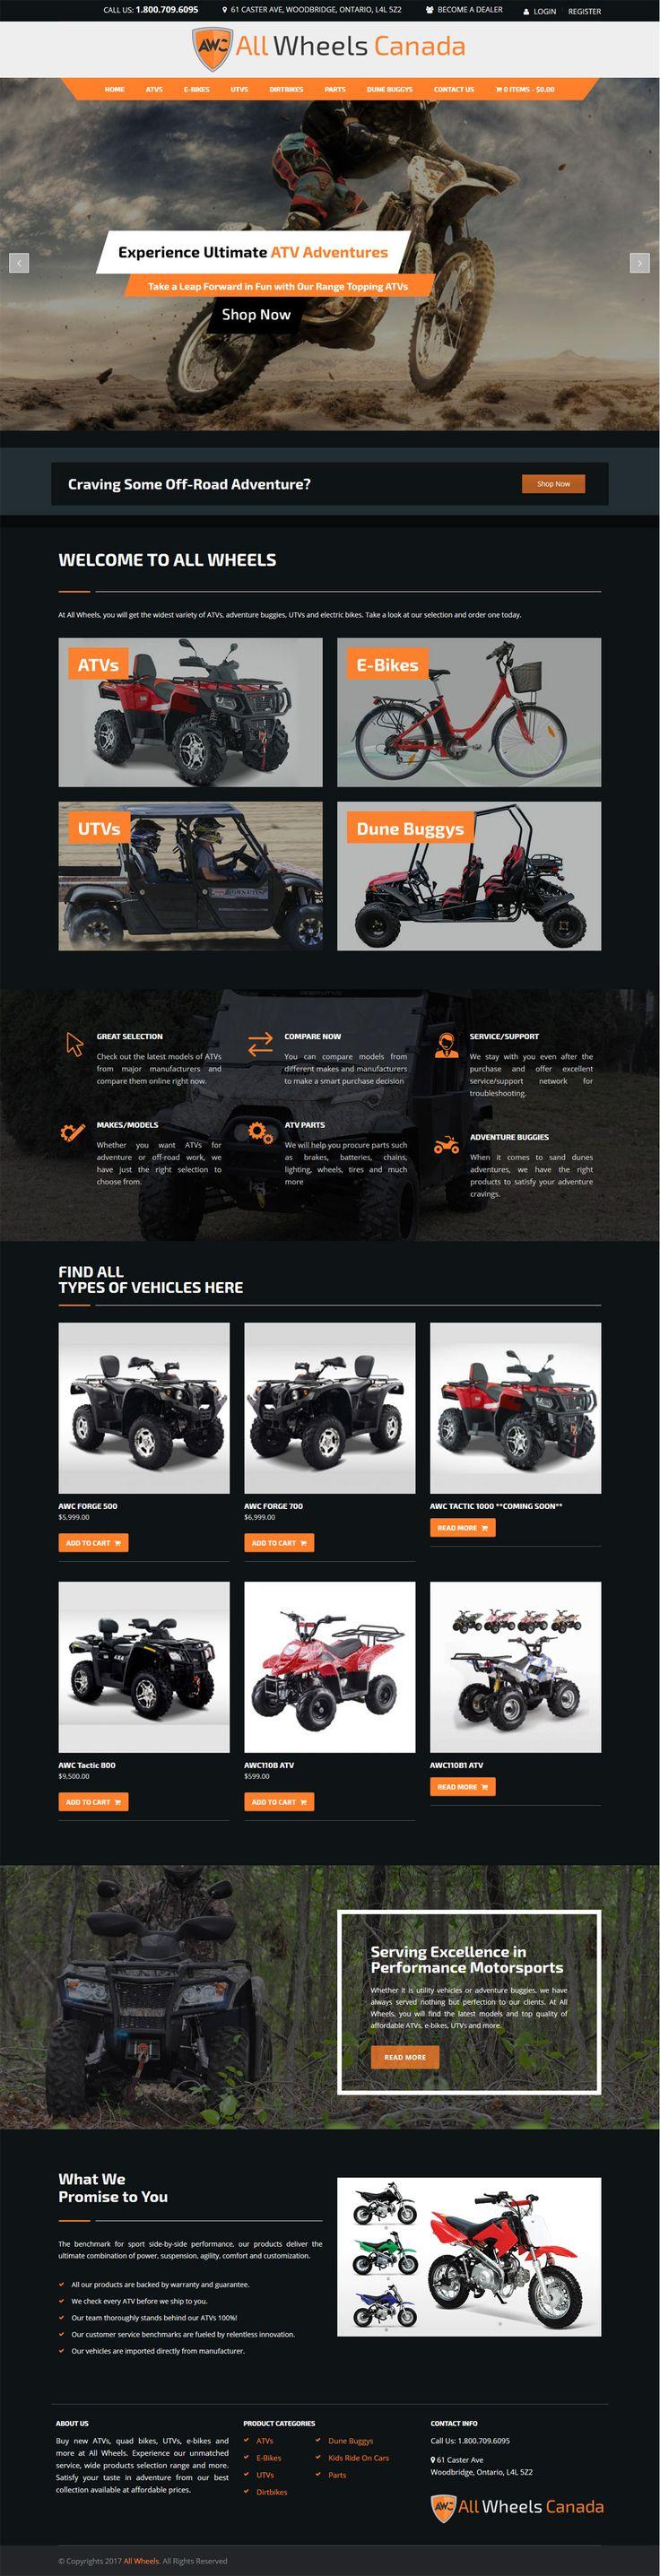 #Beautiful #eCommerce #WebsiteDesign #development #Portfolio #Mississauga #ontario #canada